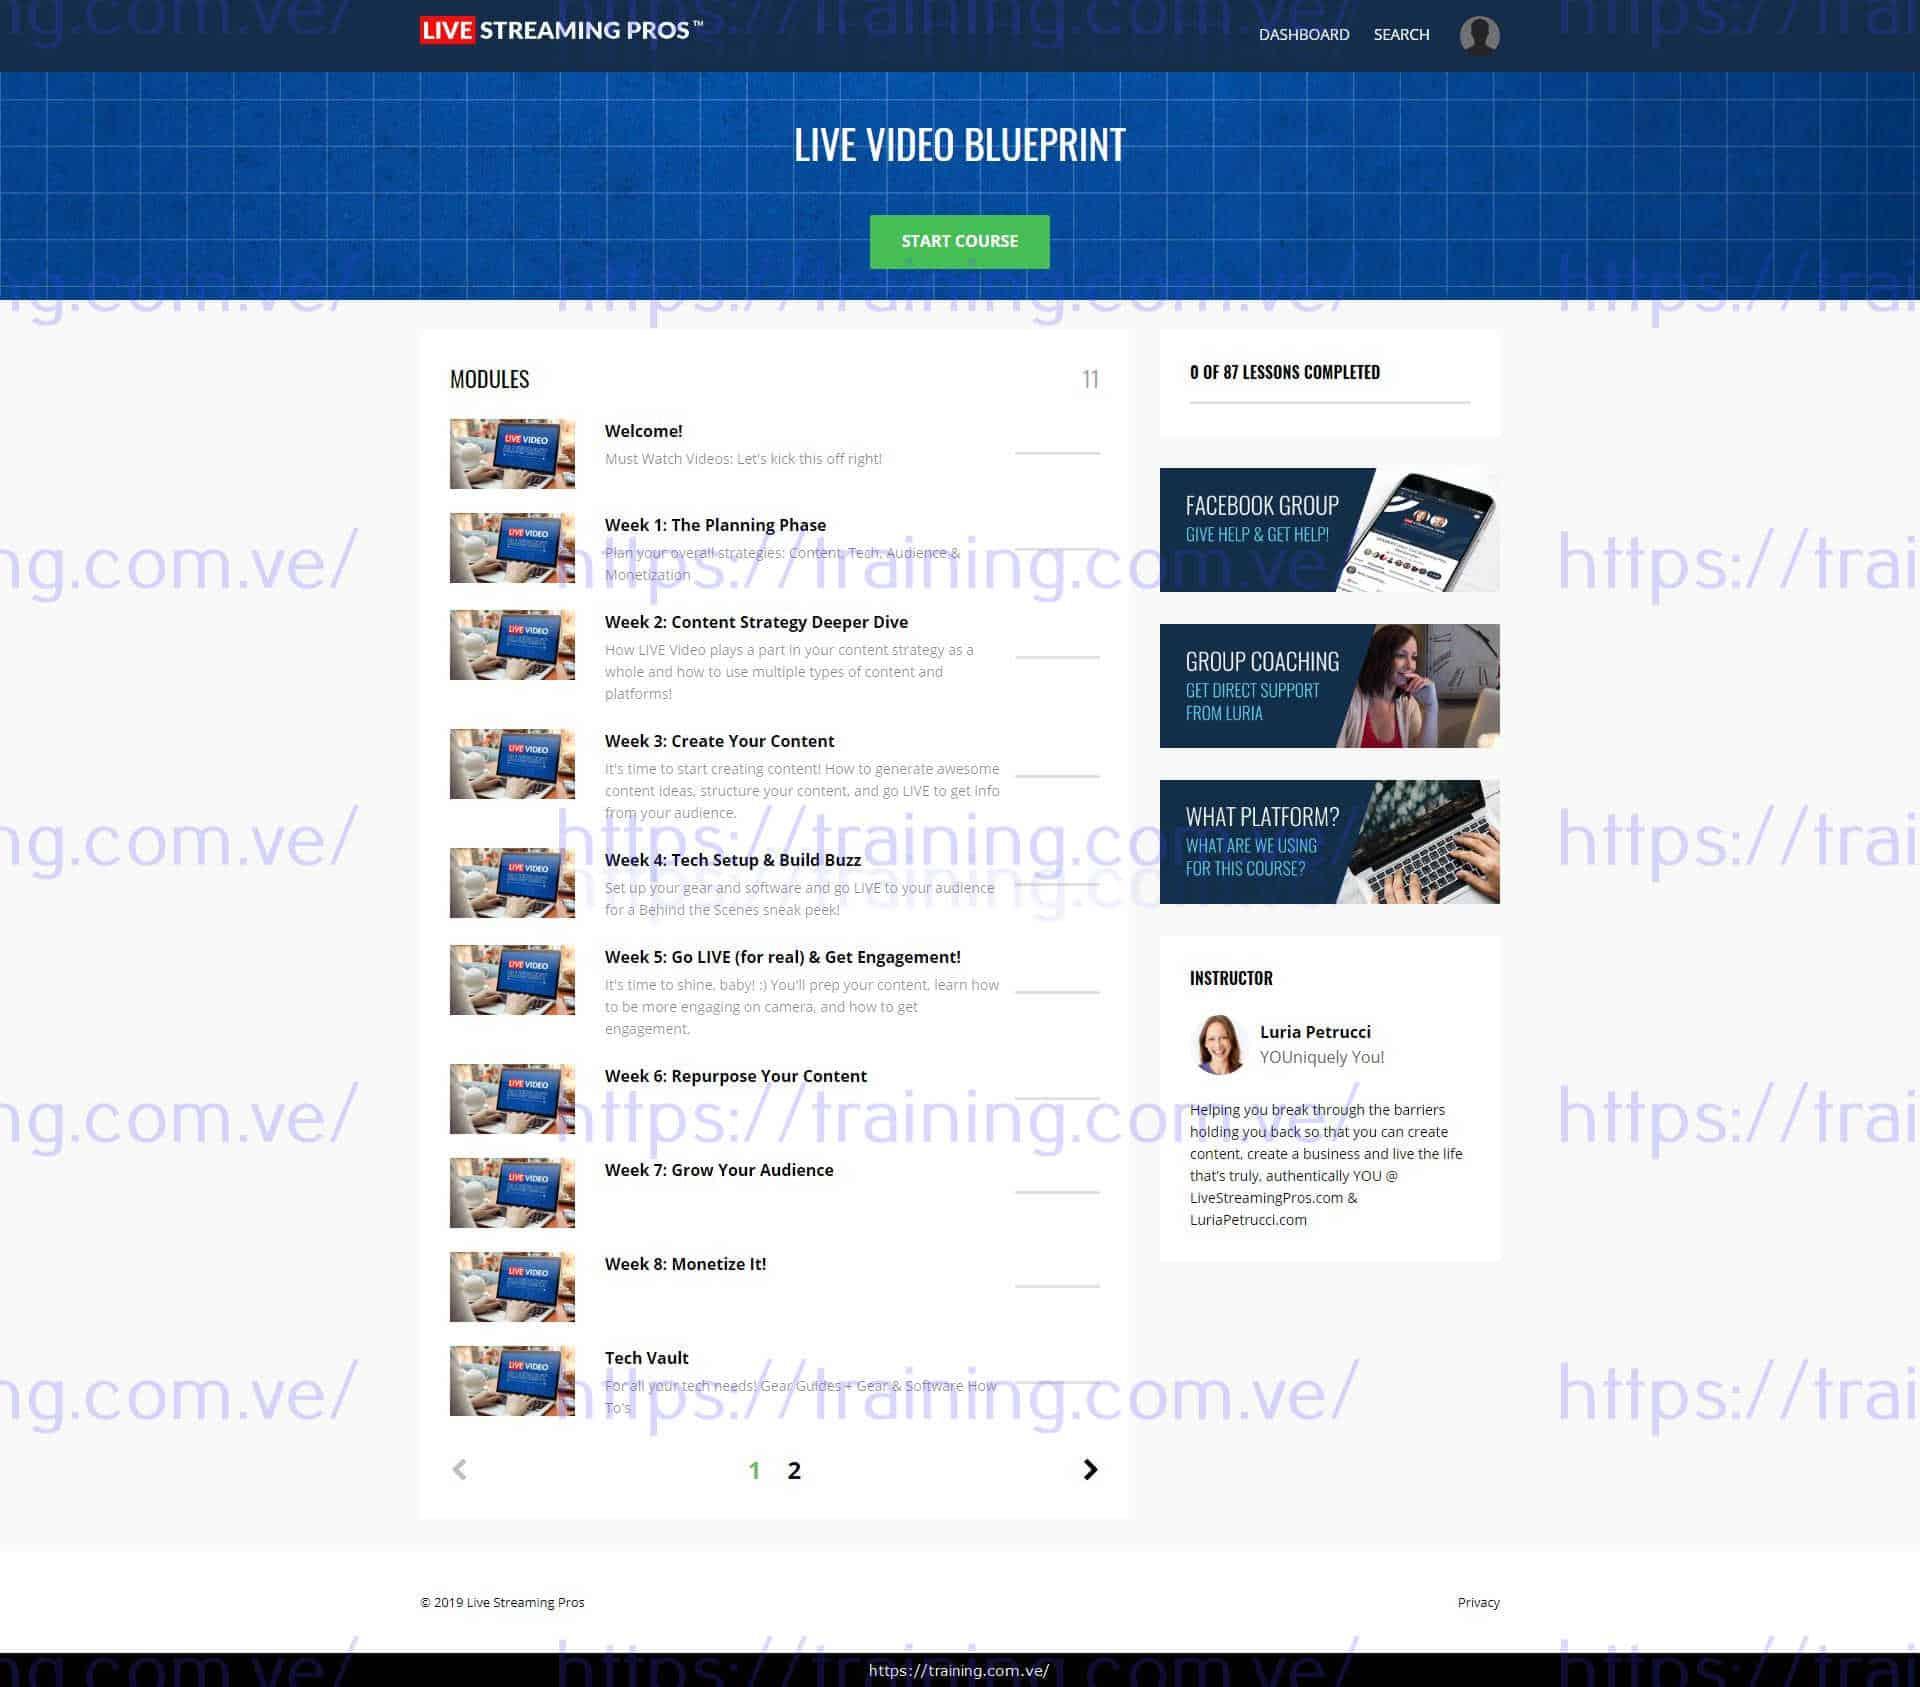 LIVE Video Blueprint torrent